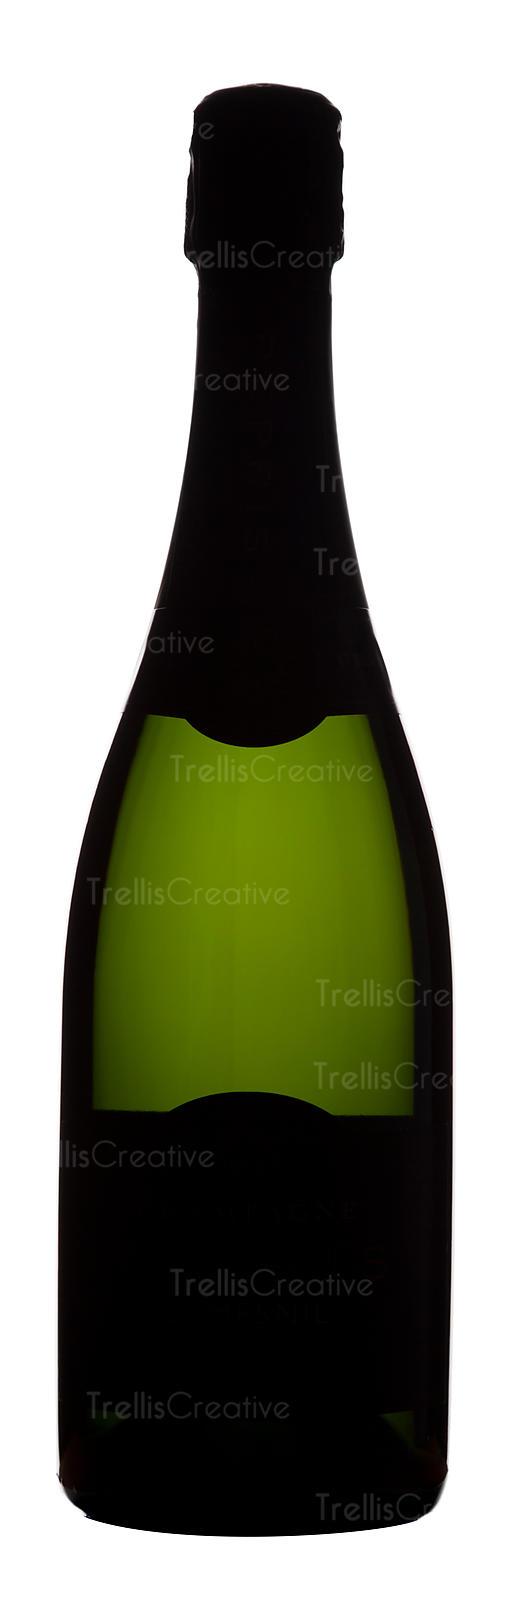 514x1600 Trellis Creative Champagne Bottle